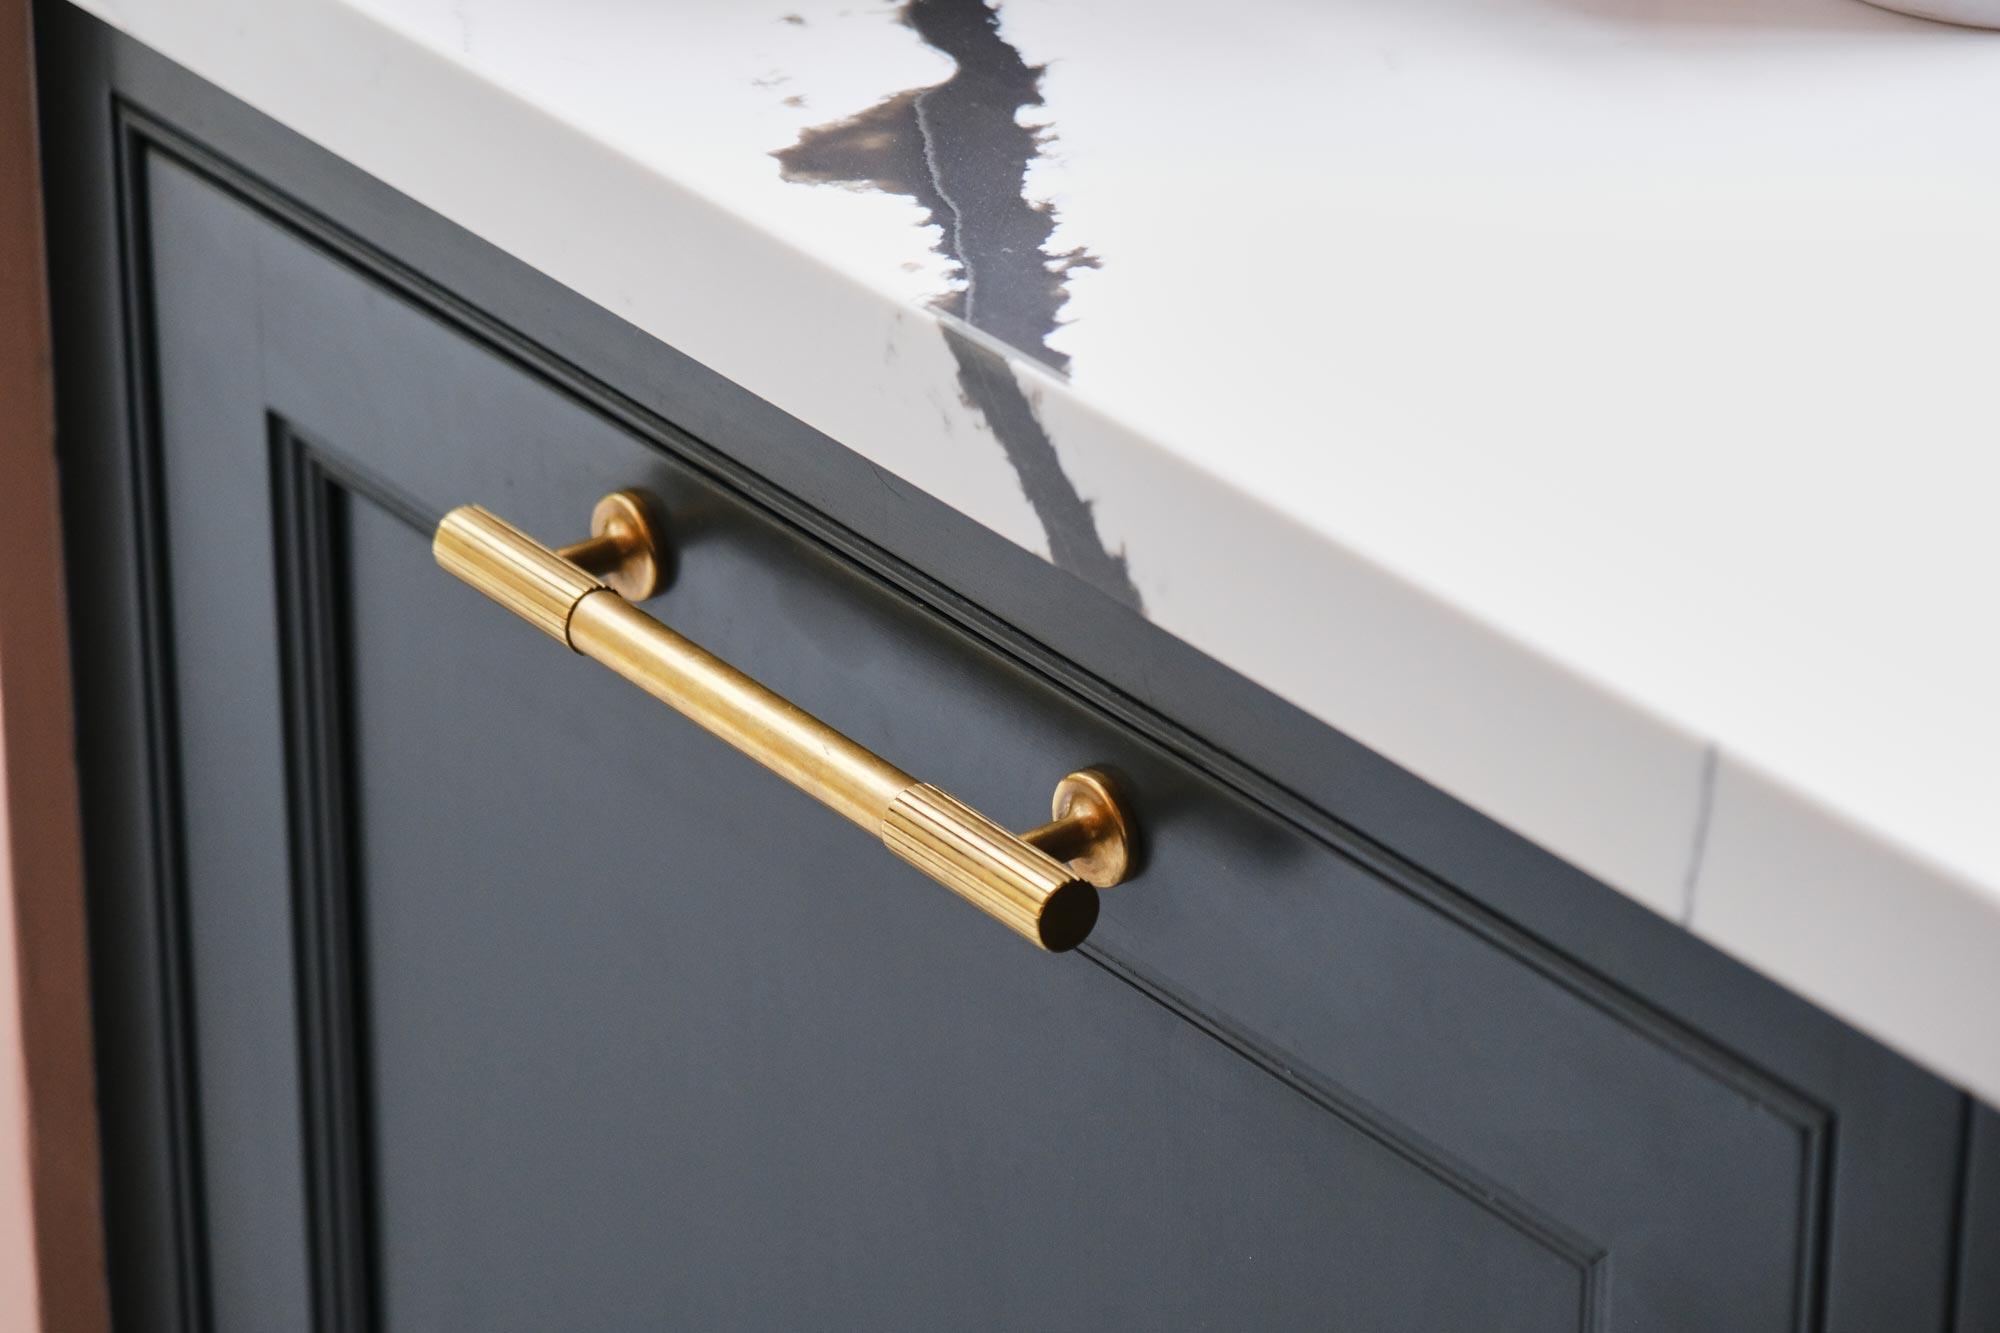 Armac Martin Brass pull handle